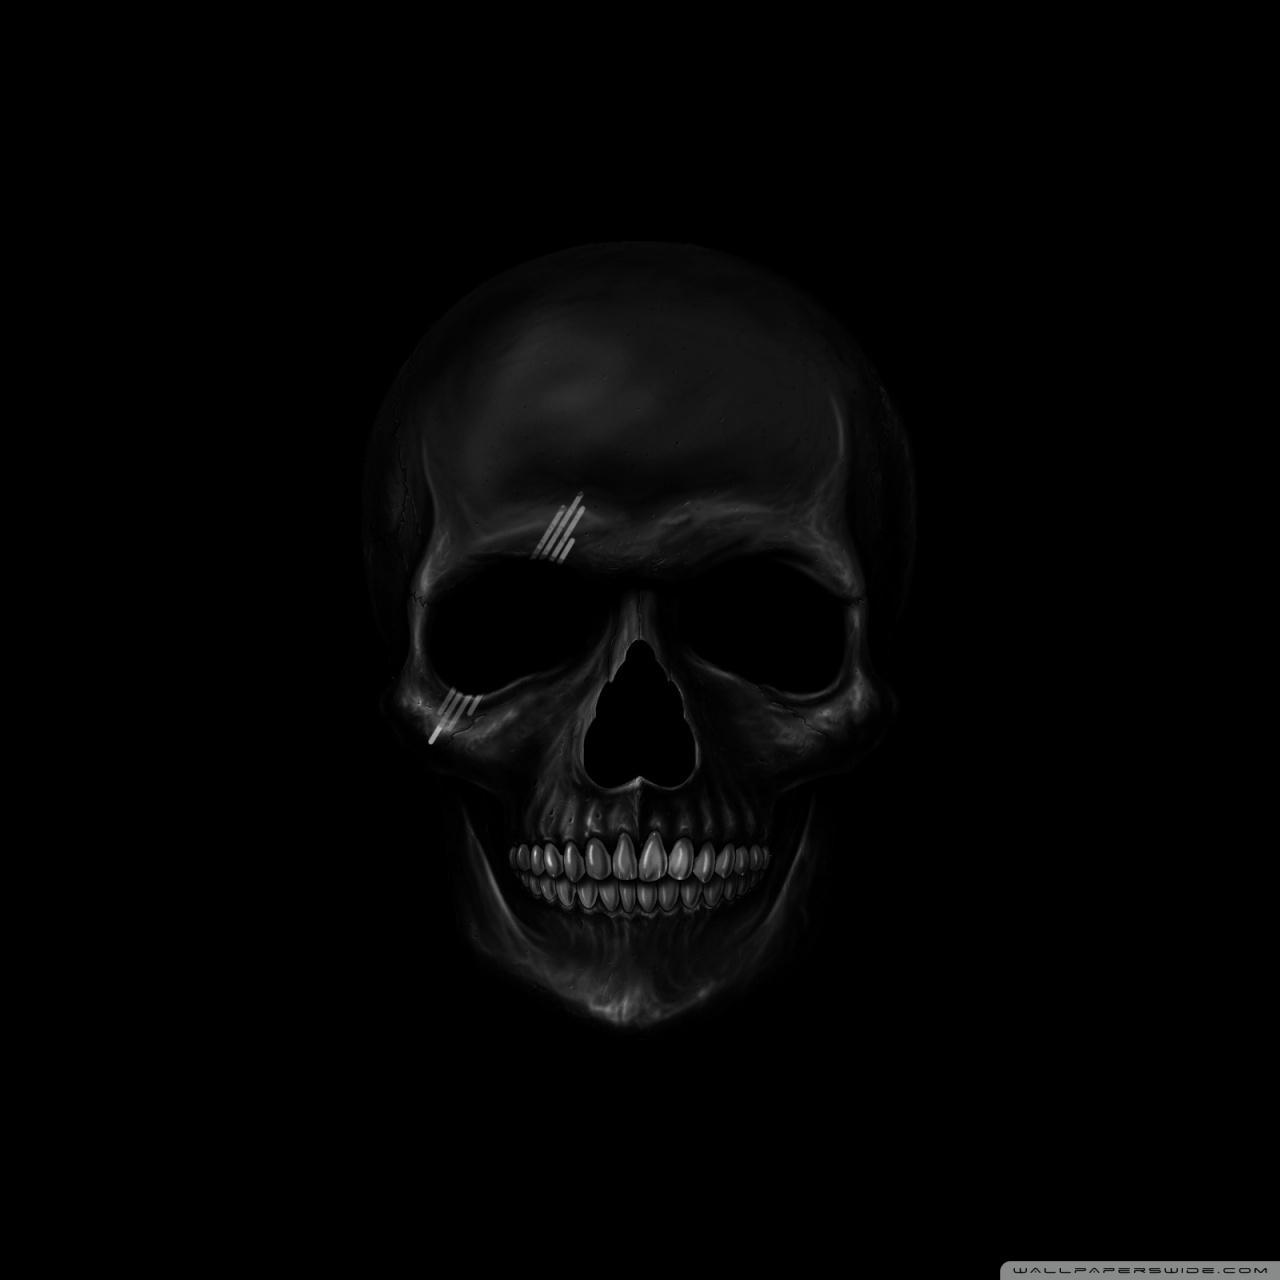 Download 88 Wallpaper Android Hd Black HD Gratid